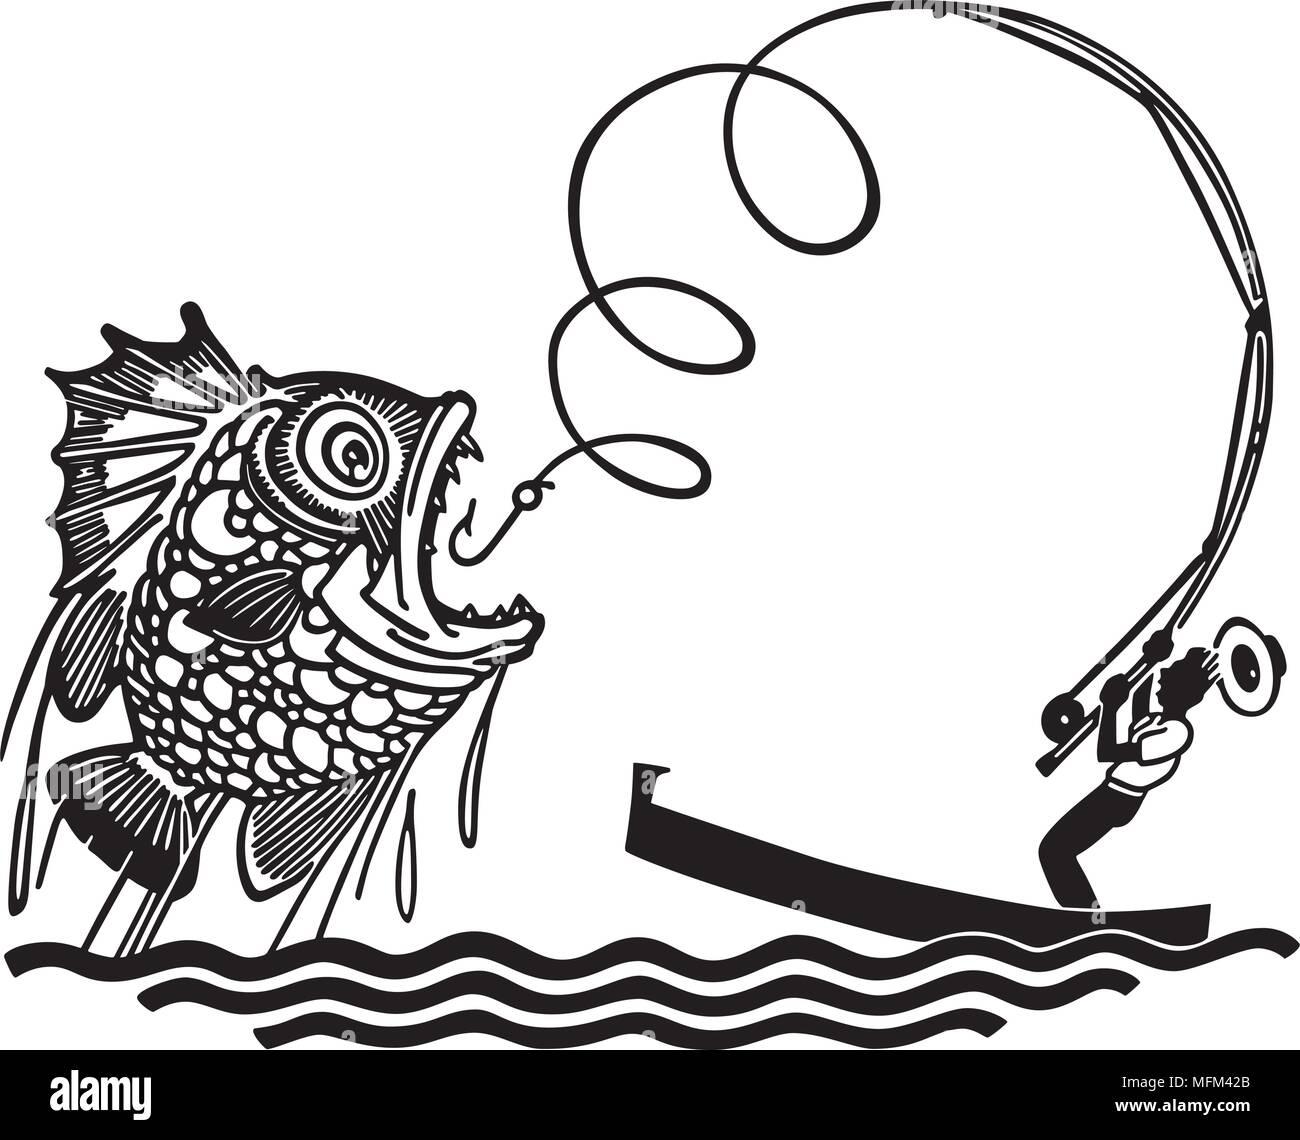 Man catching big fish retro clipart illustration stock vector art man catching big fish retro clipart illustration thecheapjerseys Choice Image